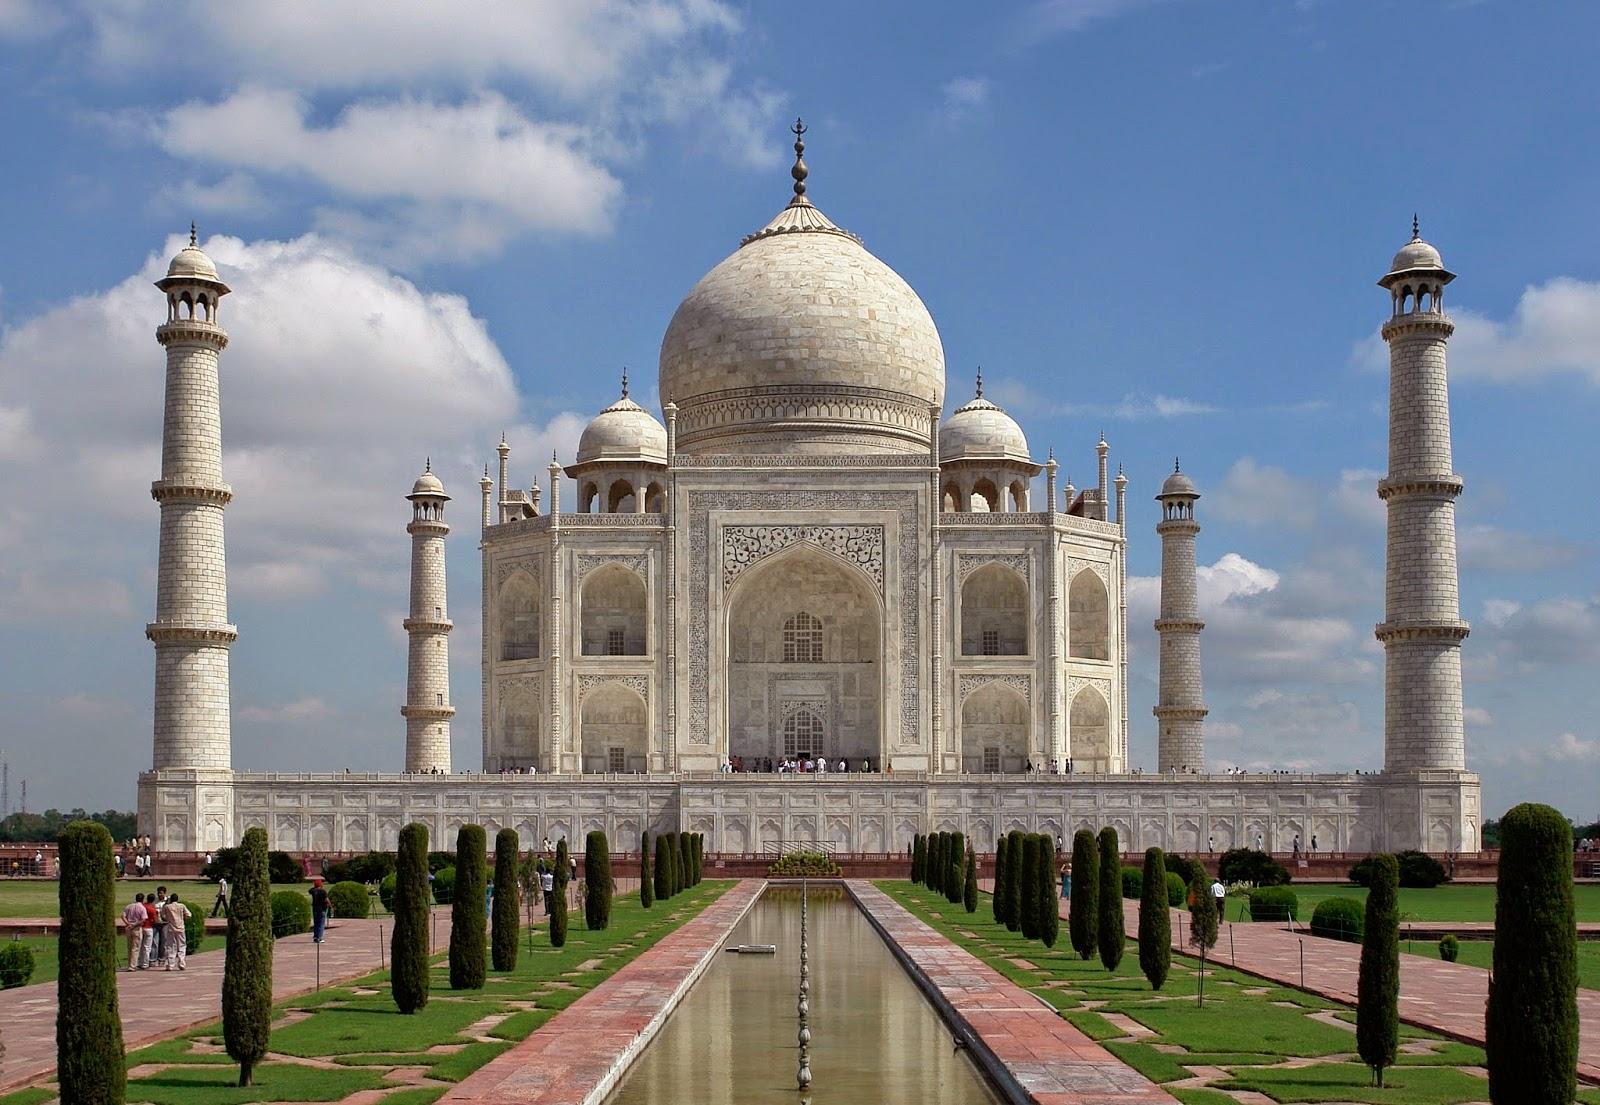 Tempat Wisata Dunia Taj Mahal India